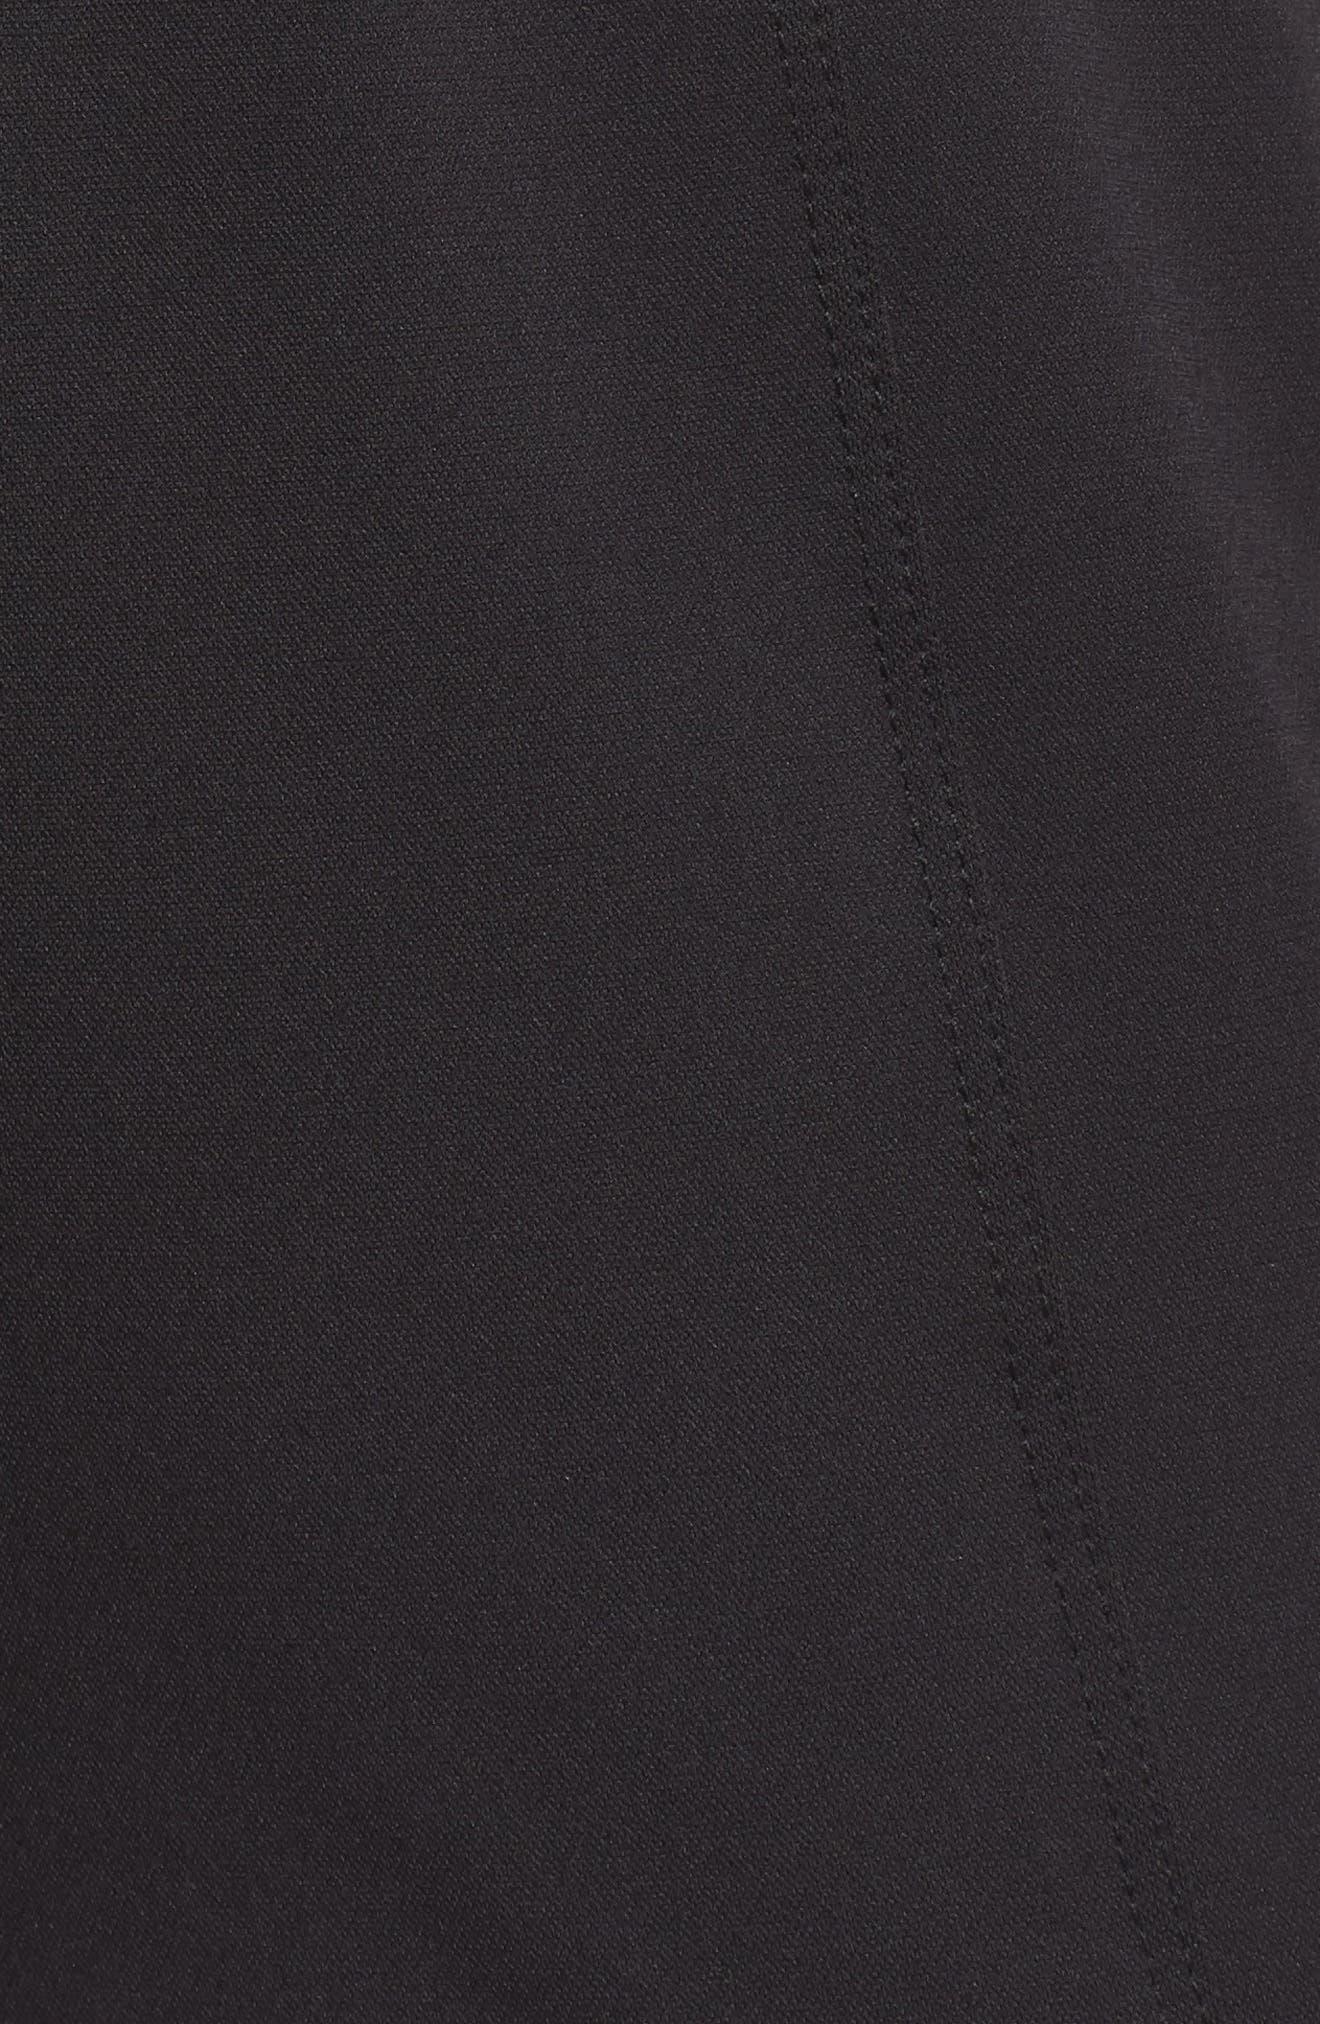 Mica Crop Track Pants,                             Alternate thumbnail 6, color,                             001